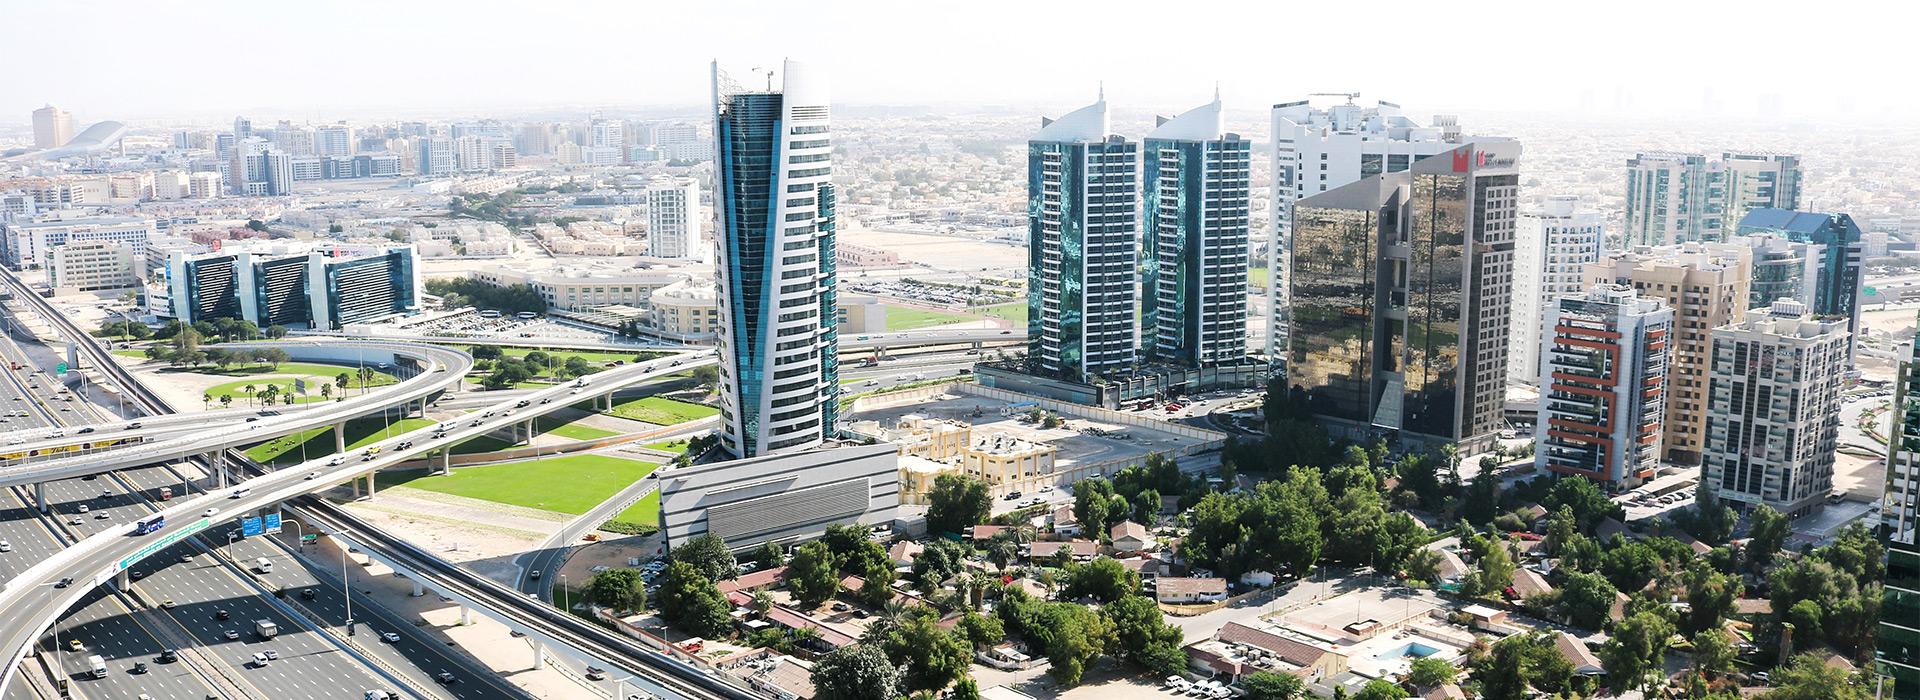 Surgical Center in Dubai: CosmeSurge